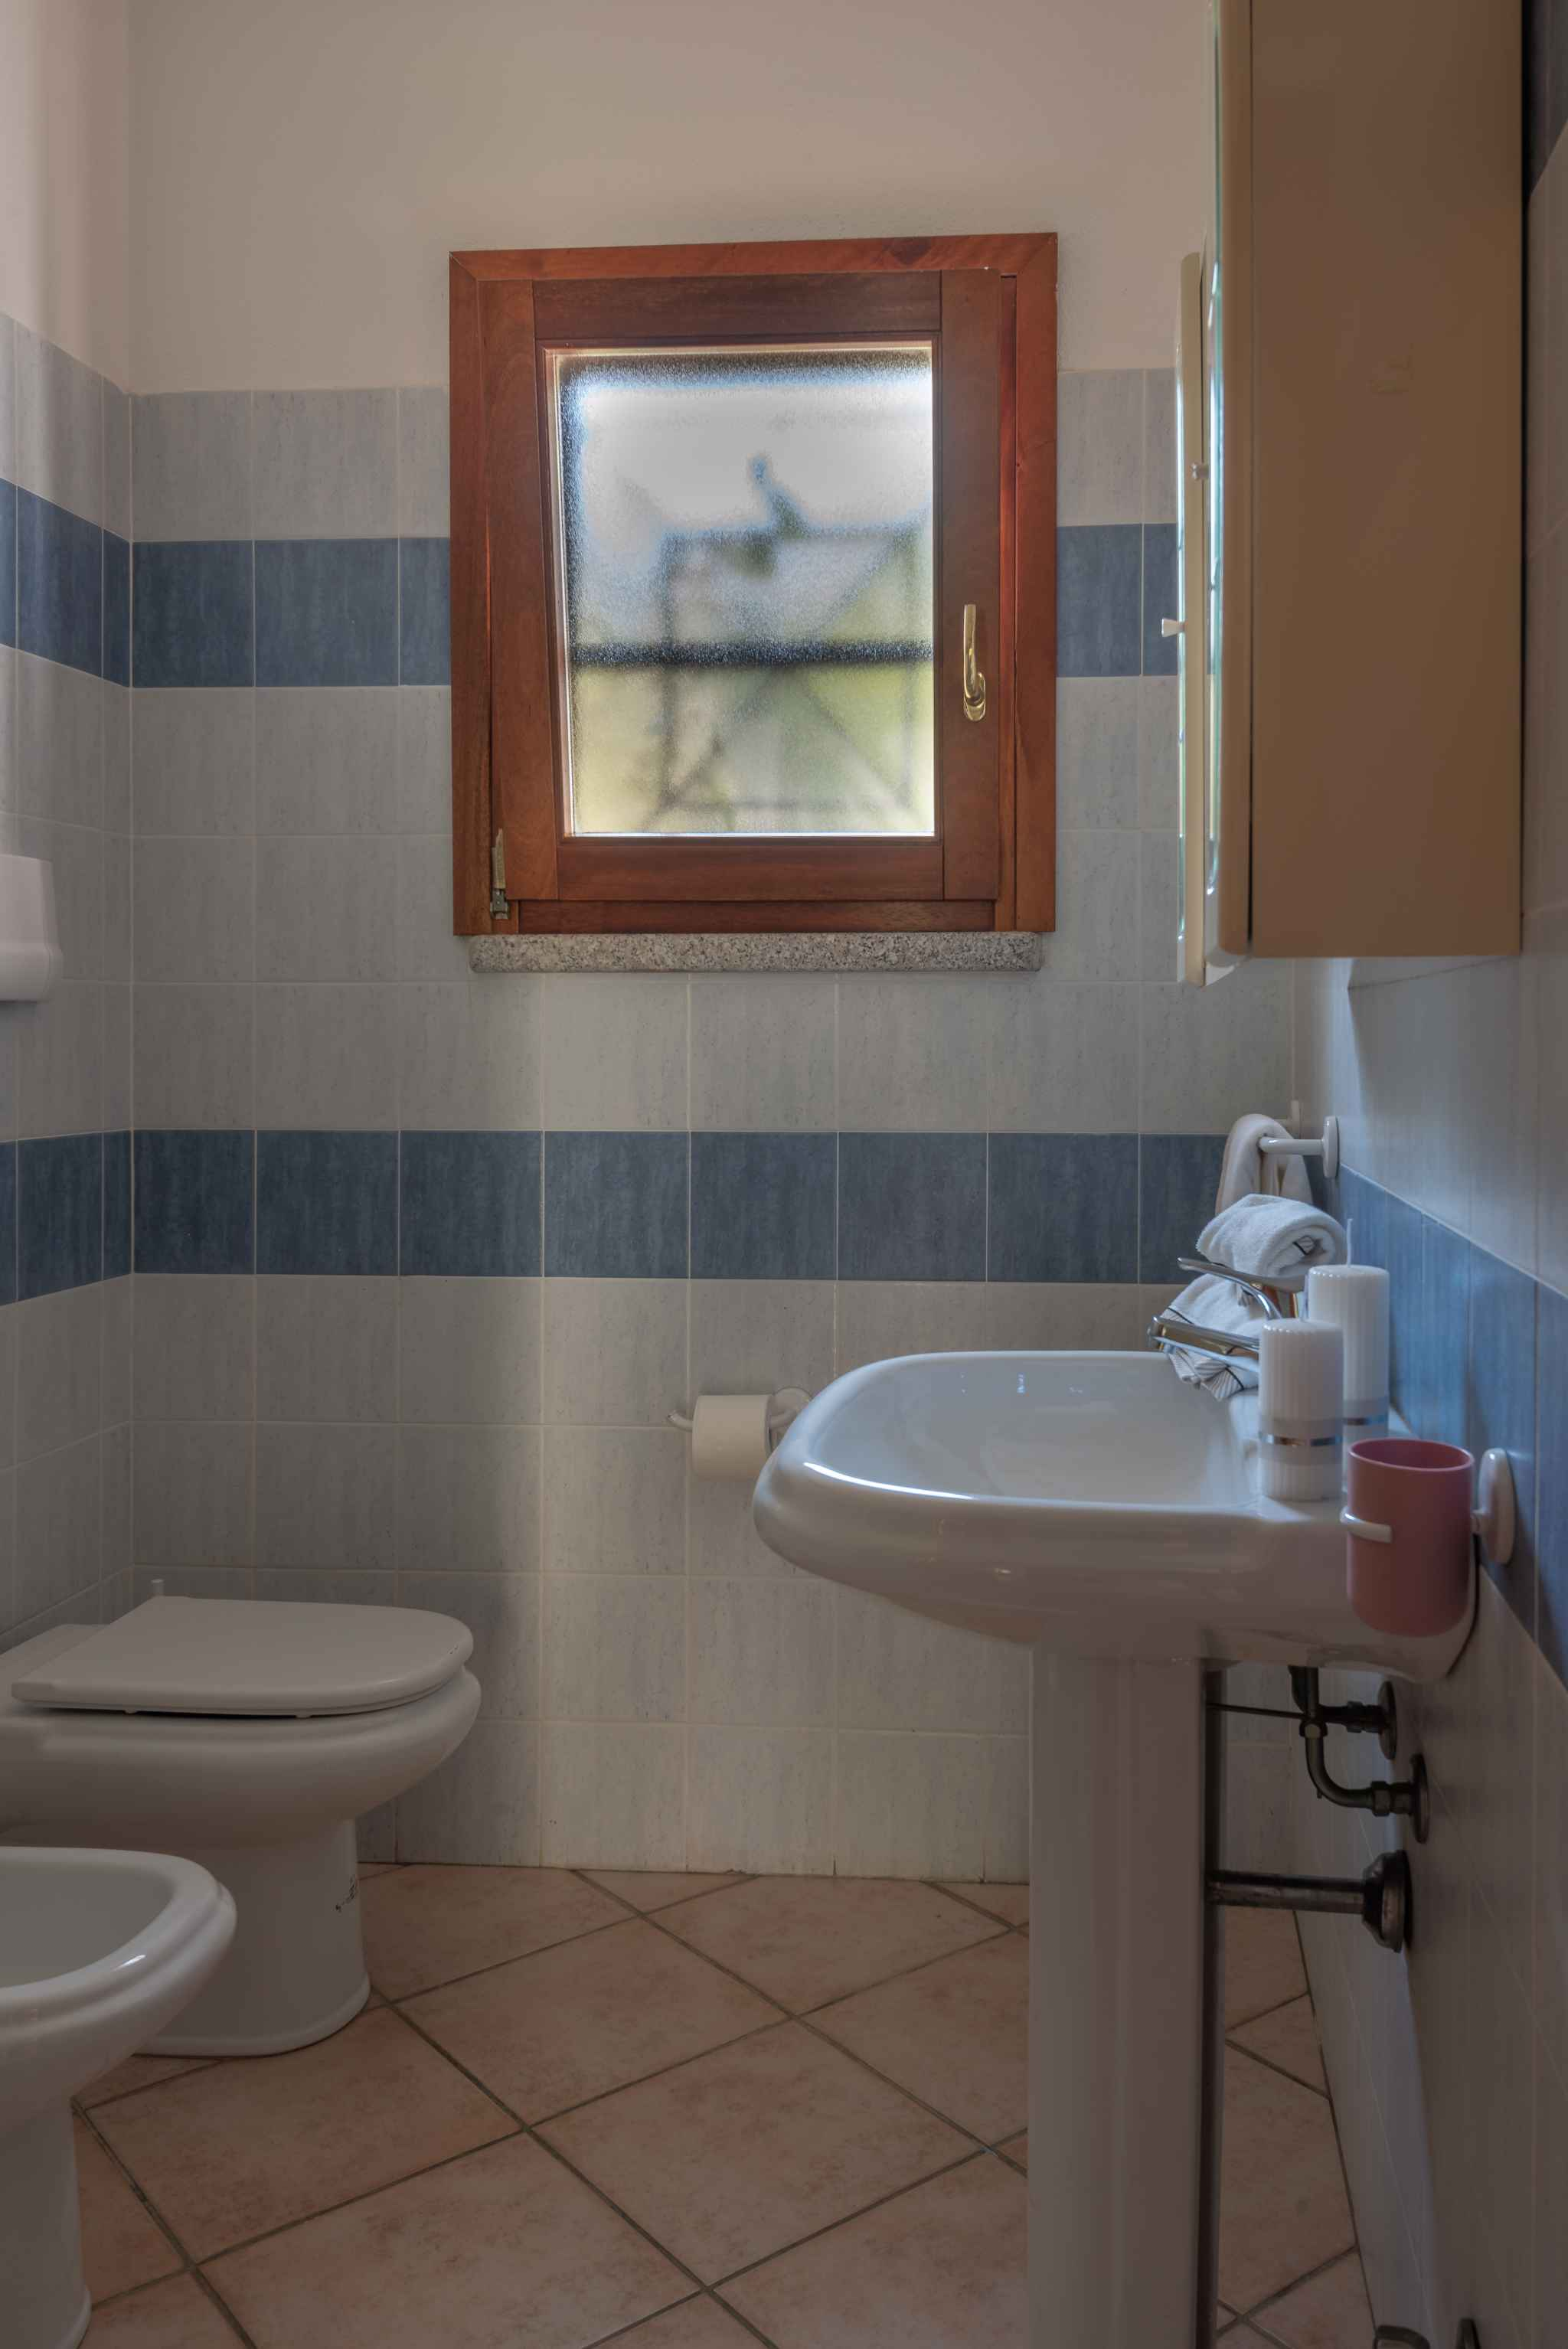 Ferienwohnung Appartamento 4 persone (2853260), Budoni, Olbia-Tempio, Sardinien, Italien, Bild 4